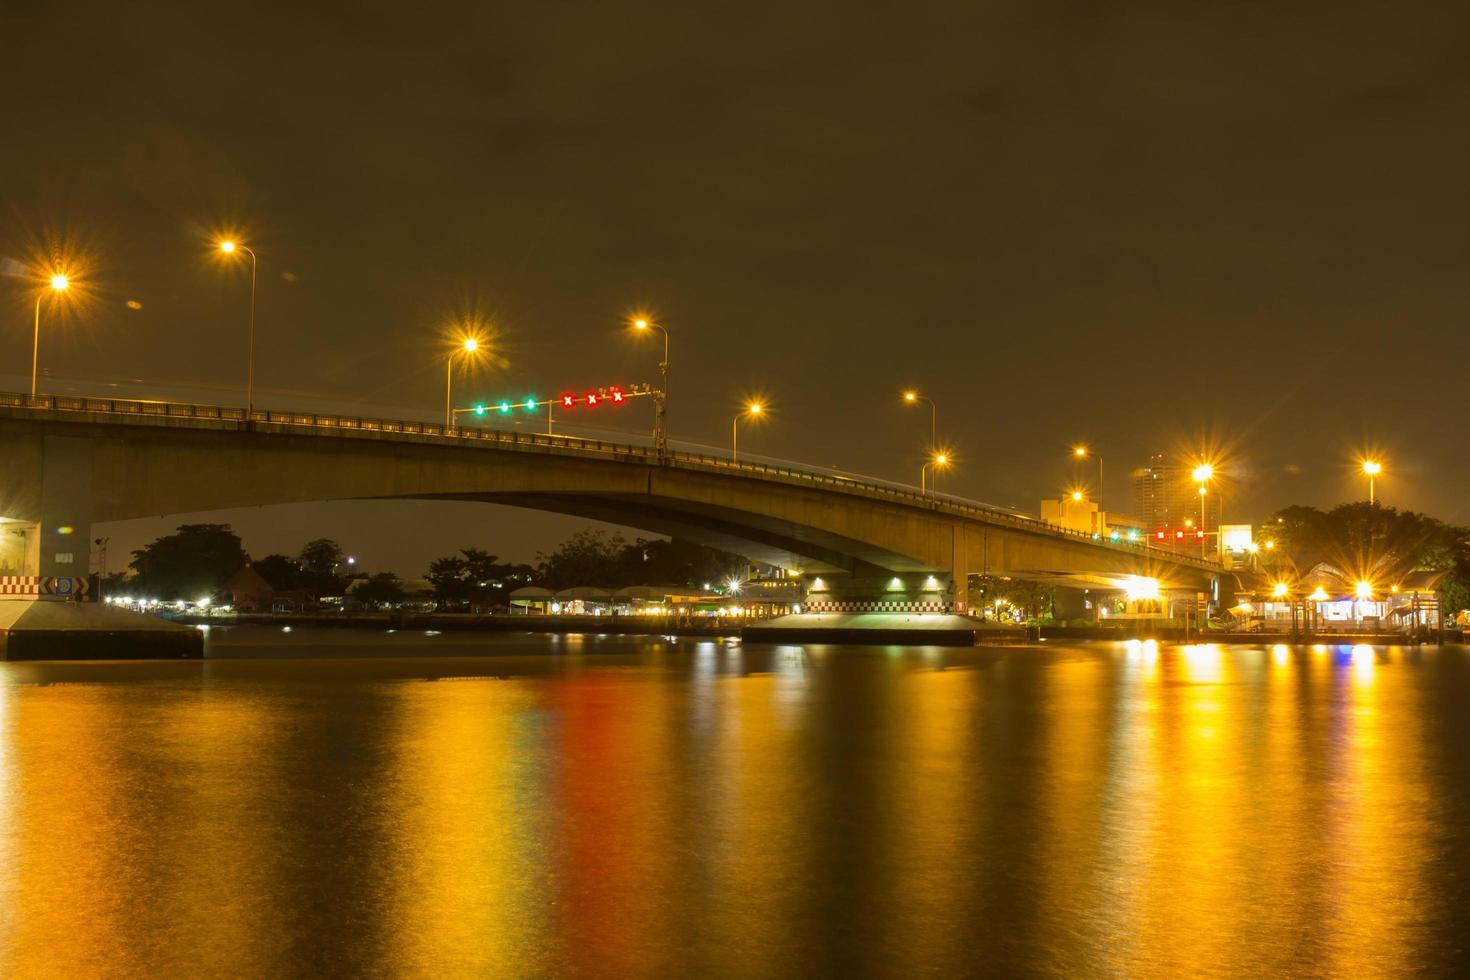 Long-exposure of a bridge over the Chao Phraya River photo